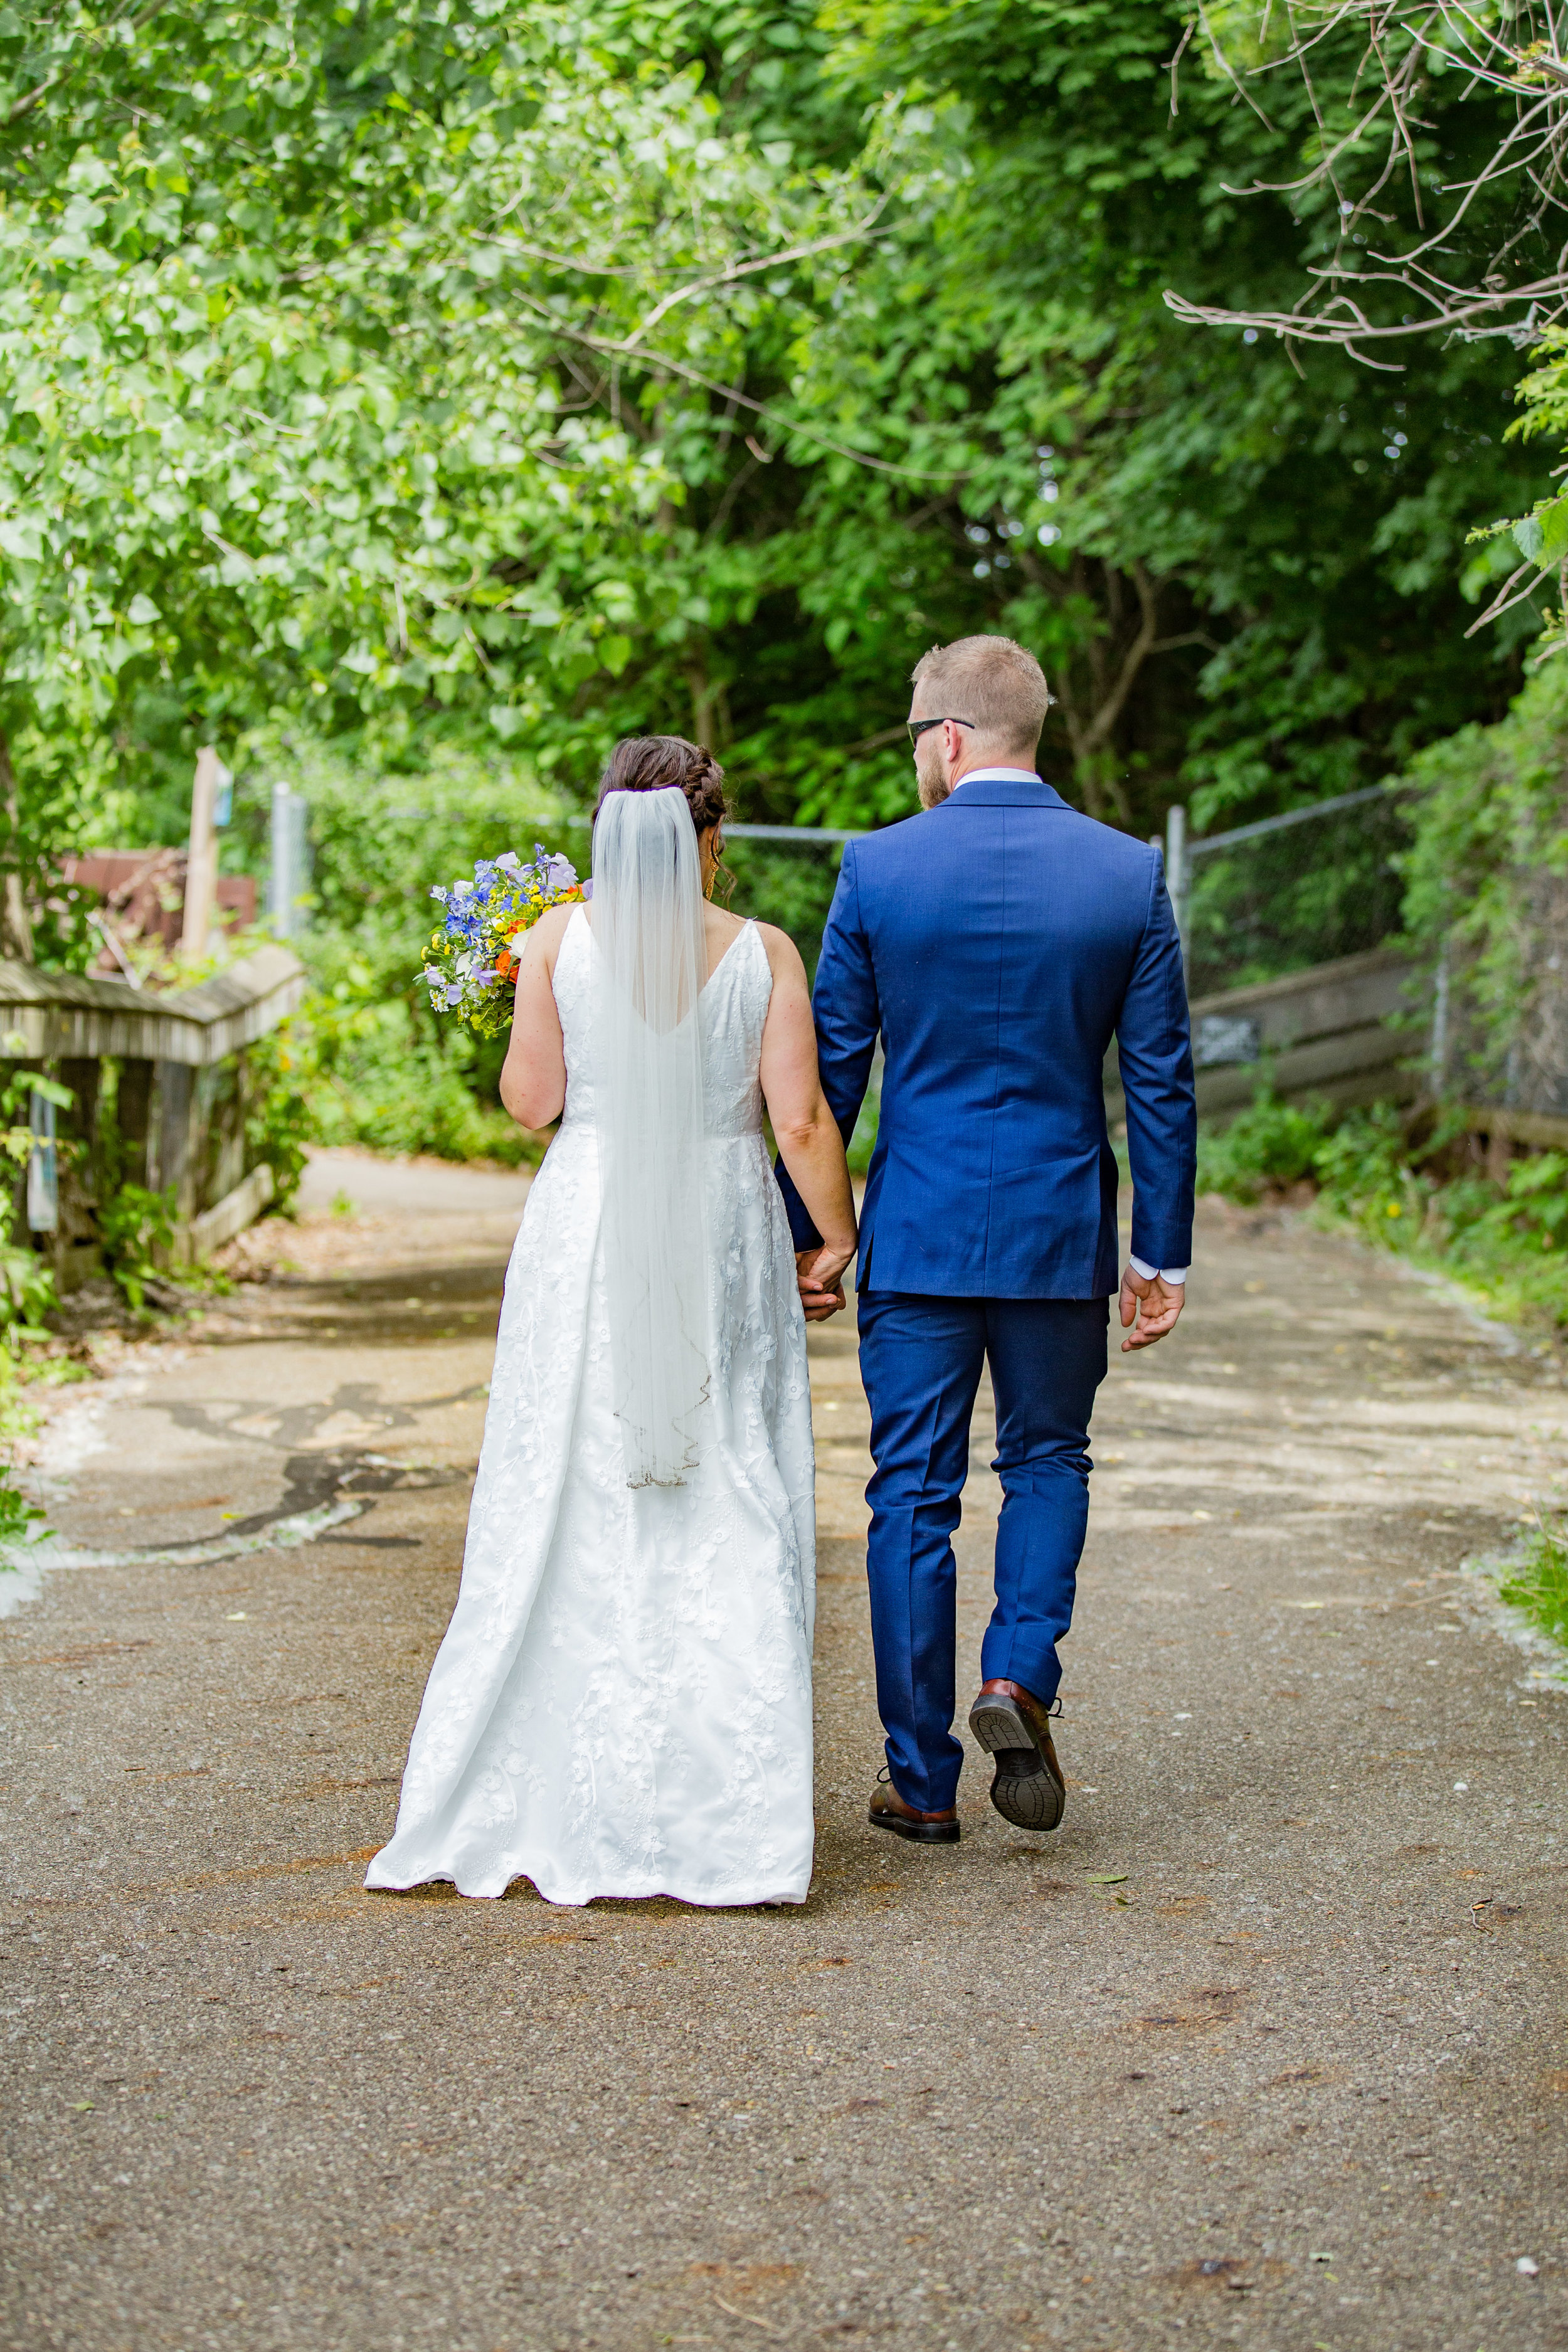 Natalie and Dallas Mooney Wedding 6-8-19_Tania Watt Photography-223.jpg